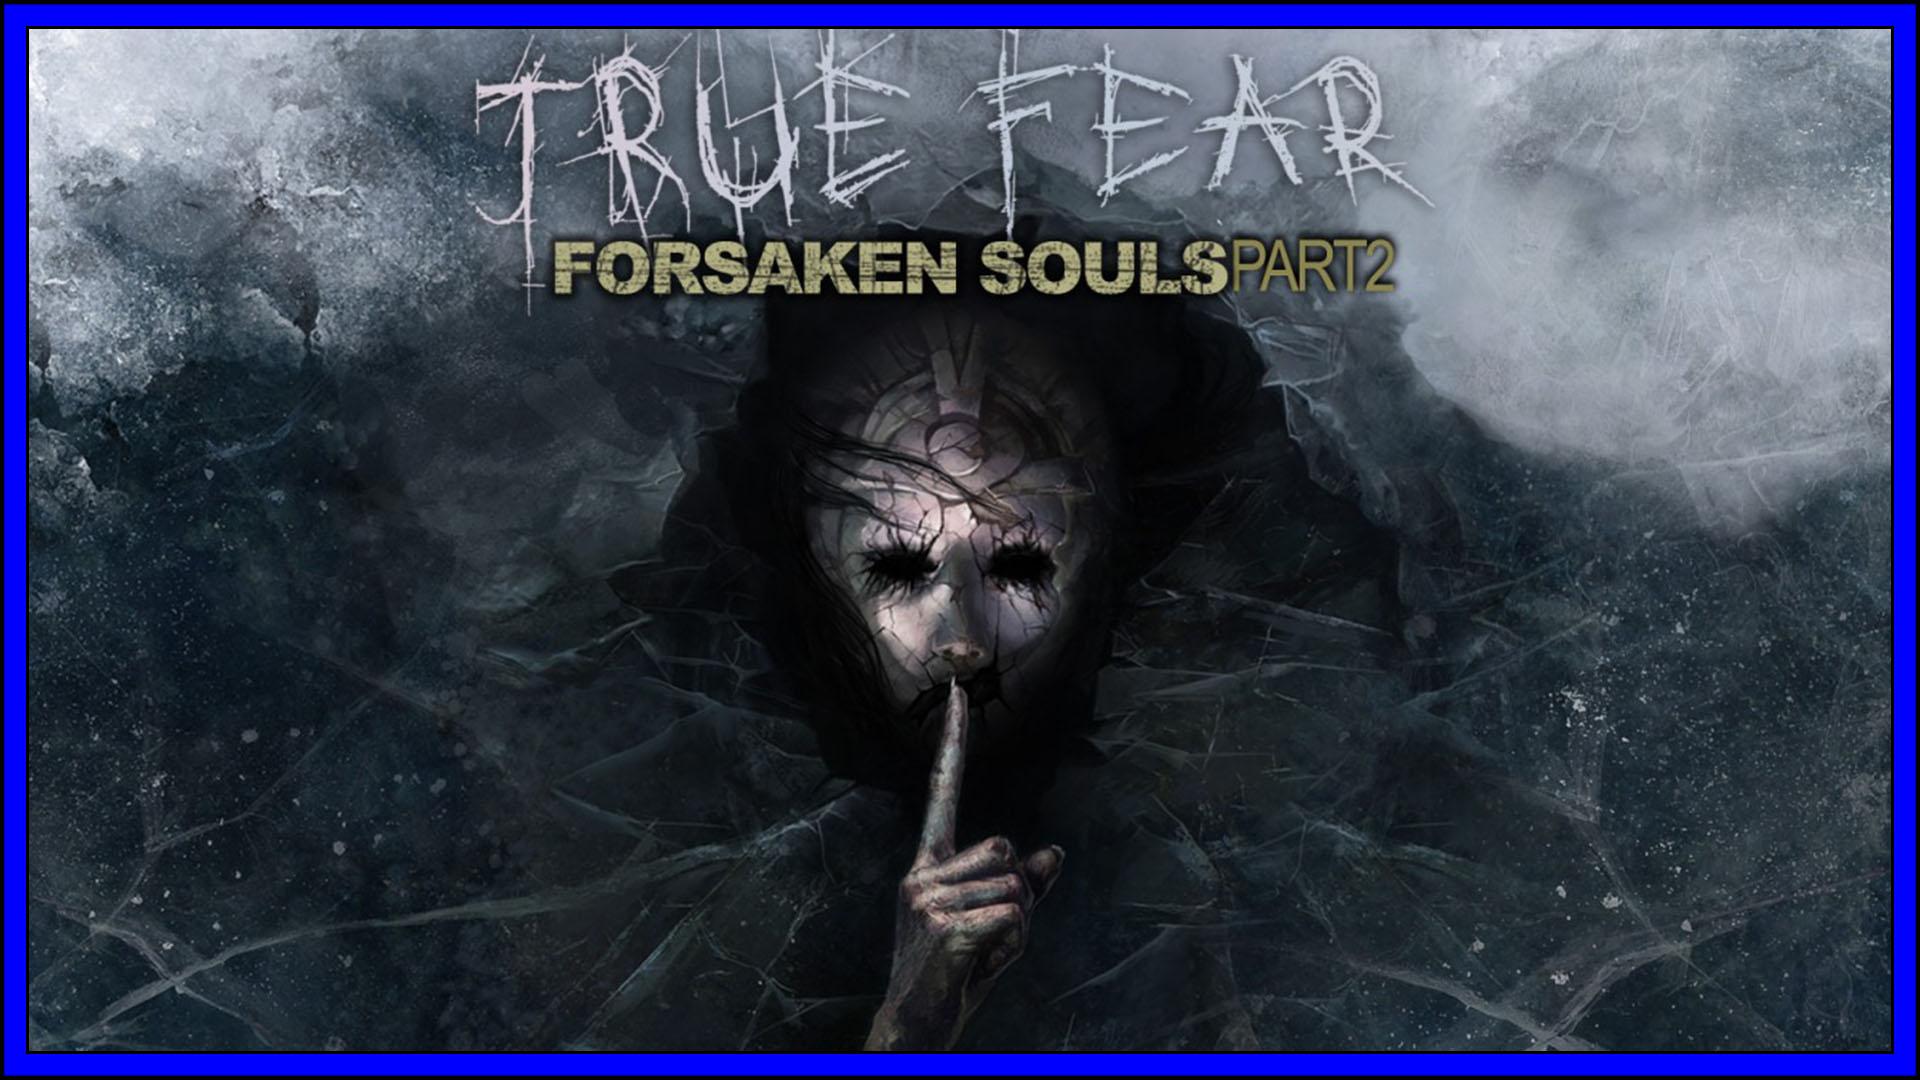 True Fear: Forsaken Souls ~ Part 2 (PS4) Review